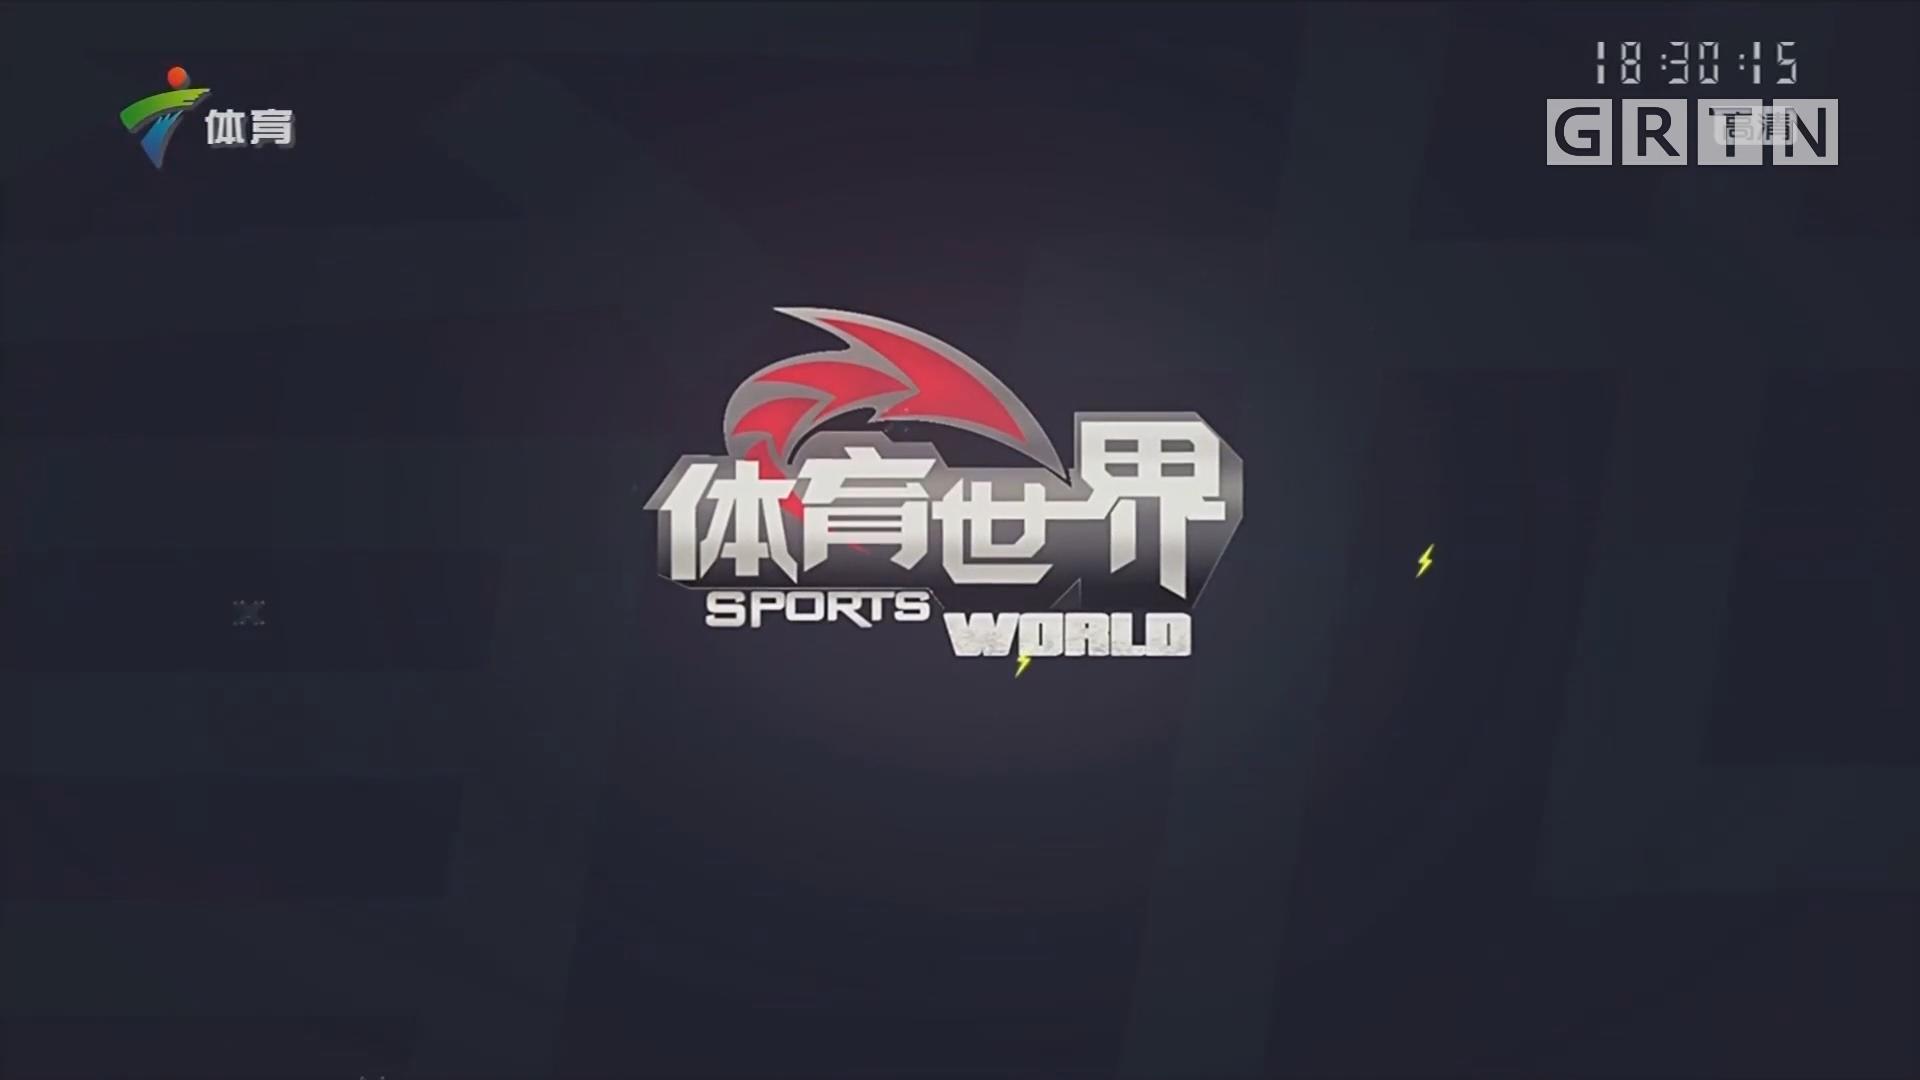 [HD][2018-11-25]体育世界:首届粤港澳大湾区学生体育节在广州开幕